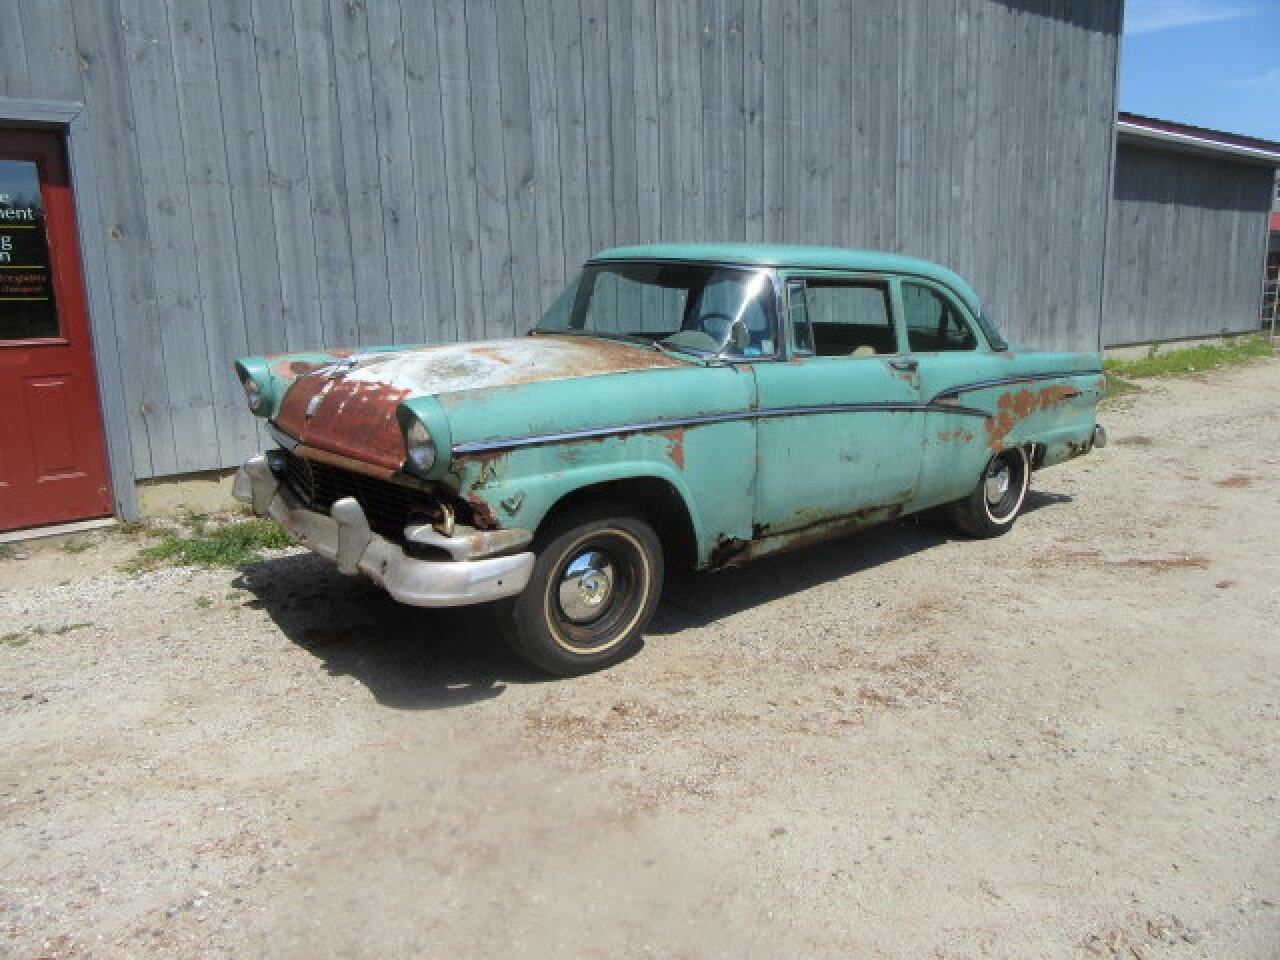 1956 Ford Customline For Sale Near Freeport, Maine 04032